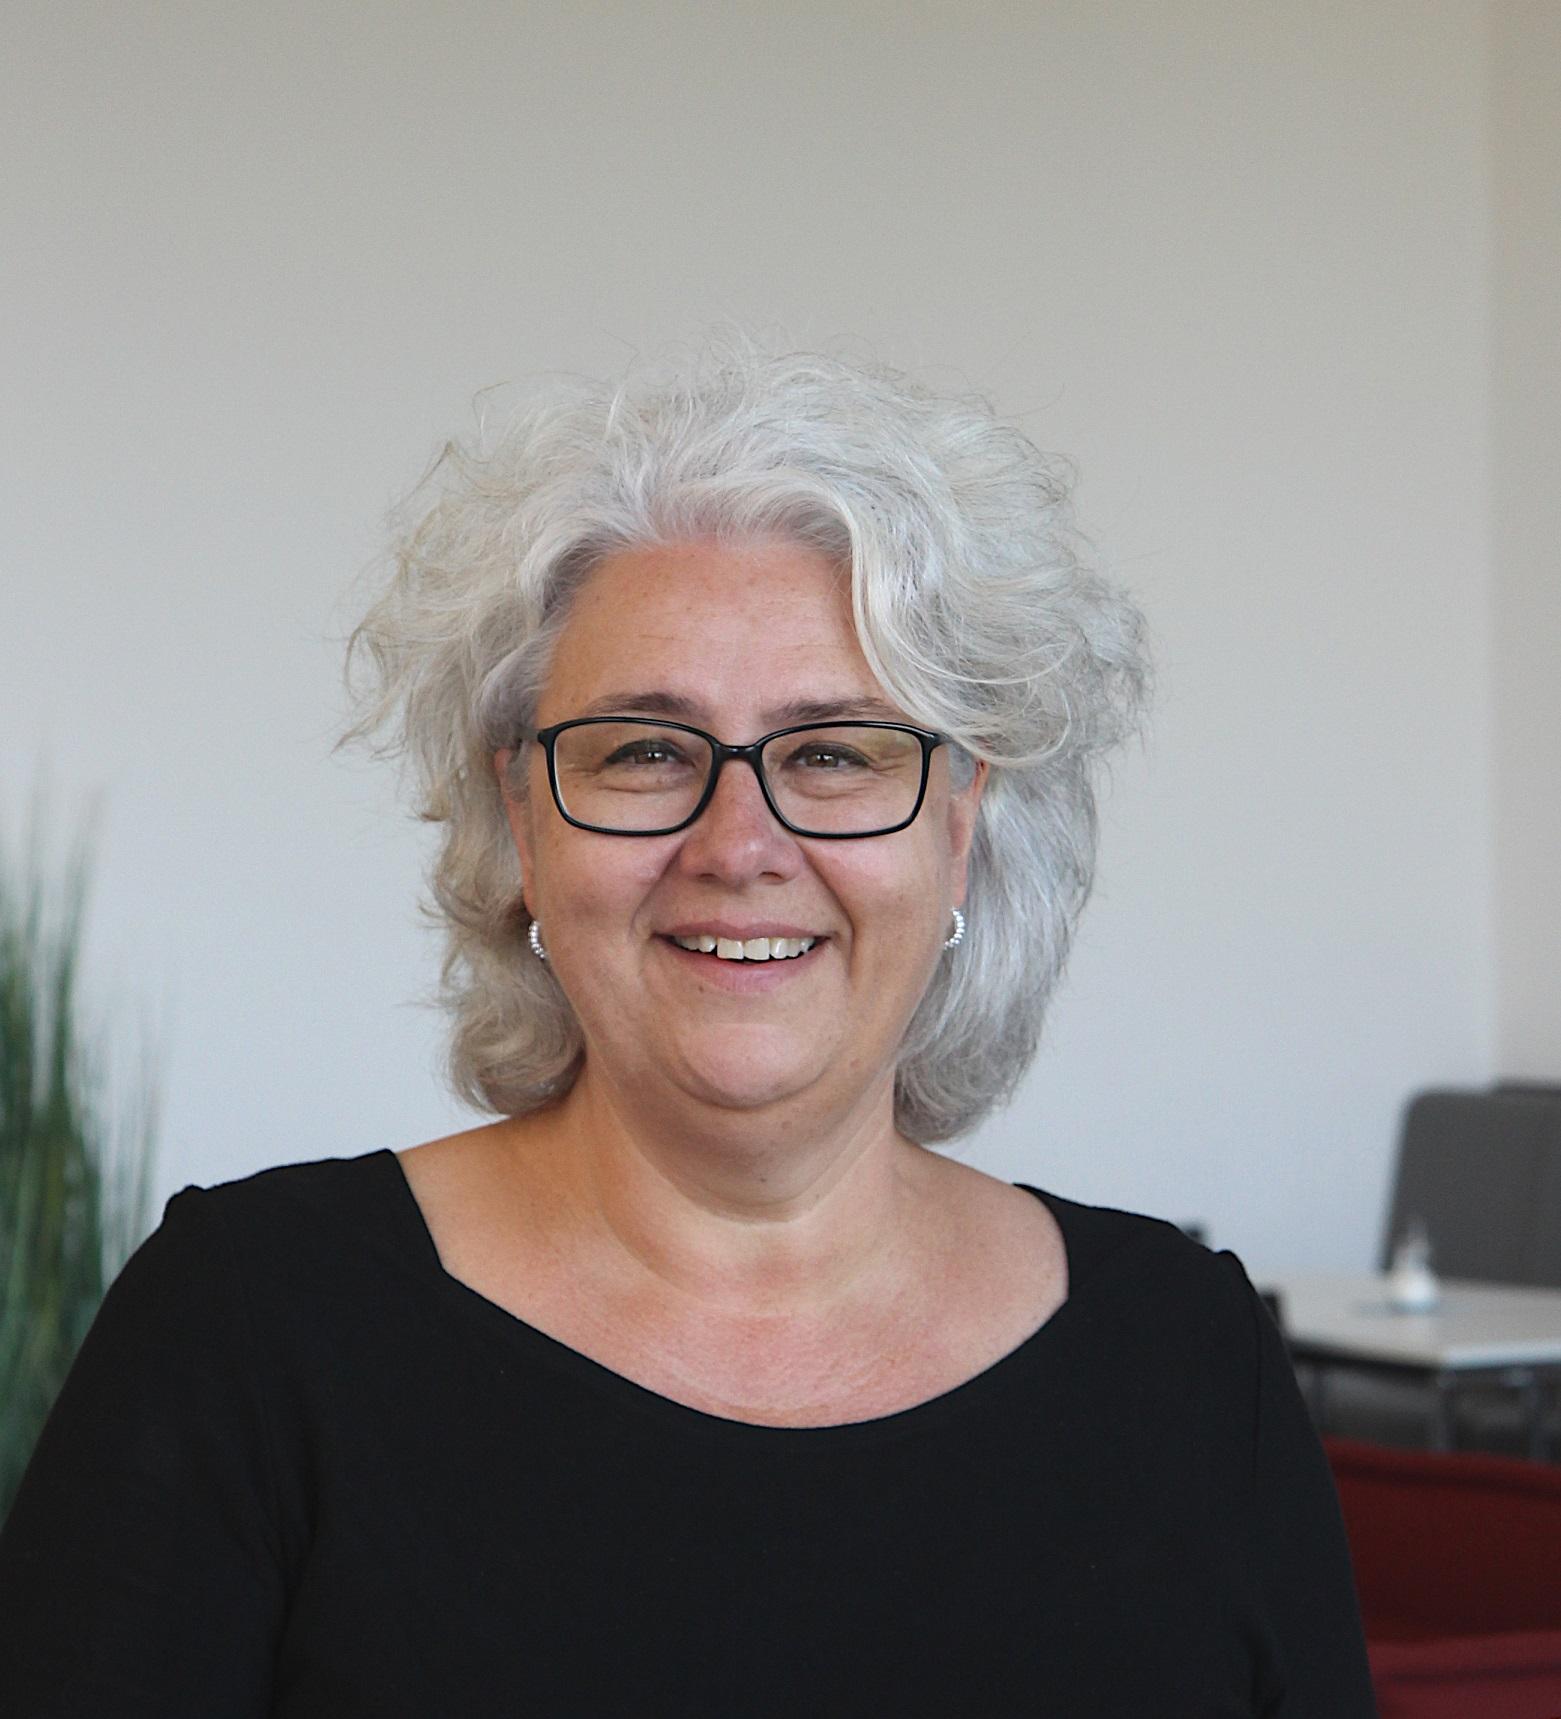 Bettina Wilke